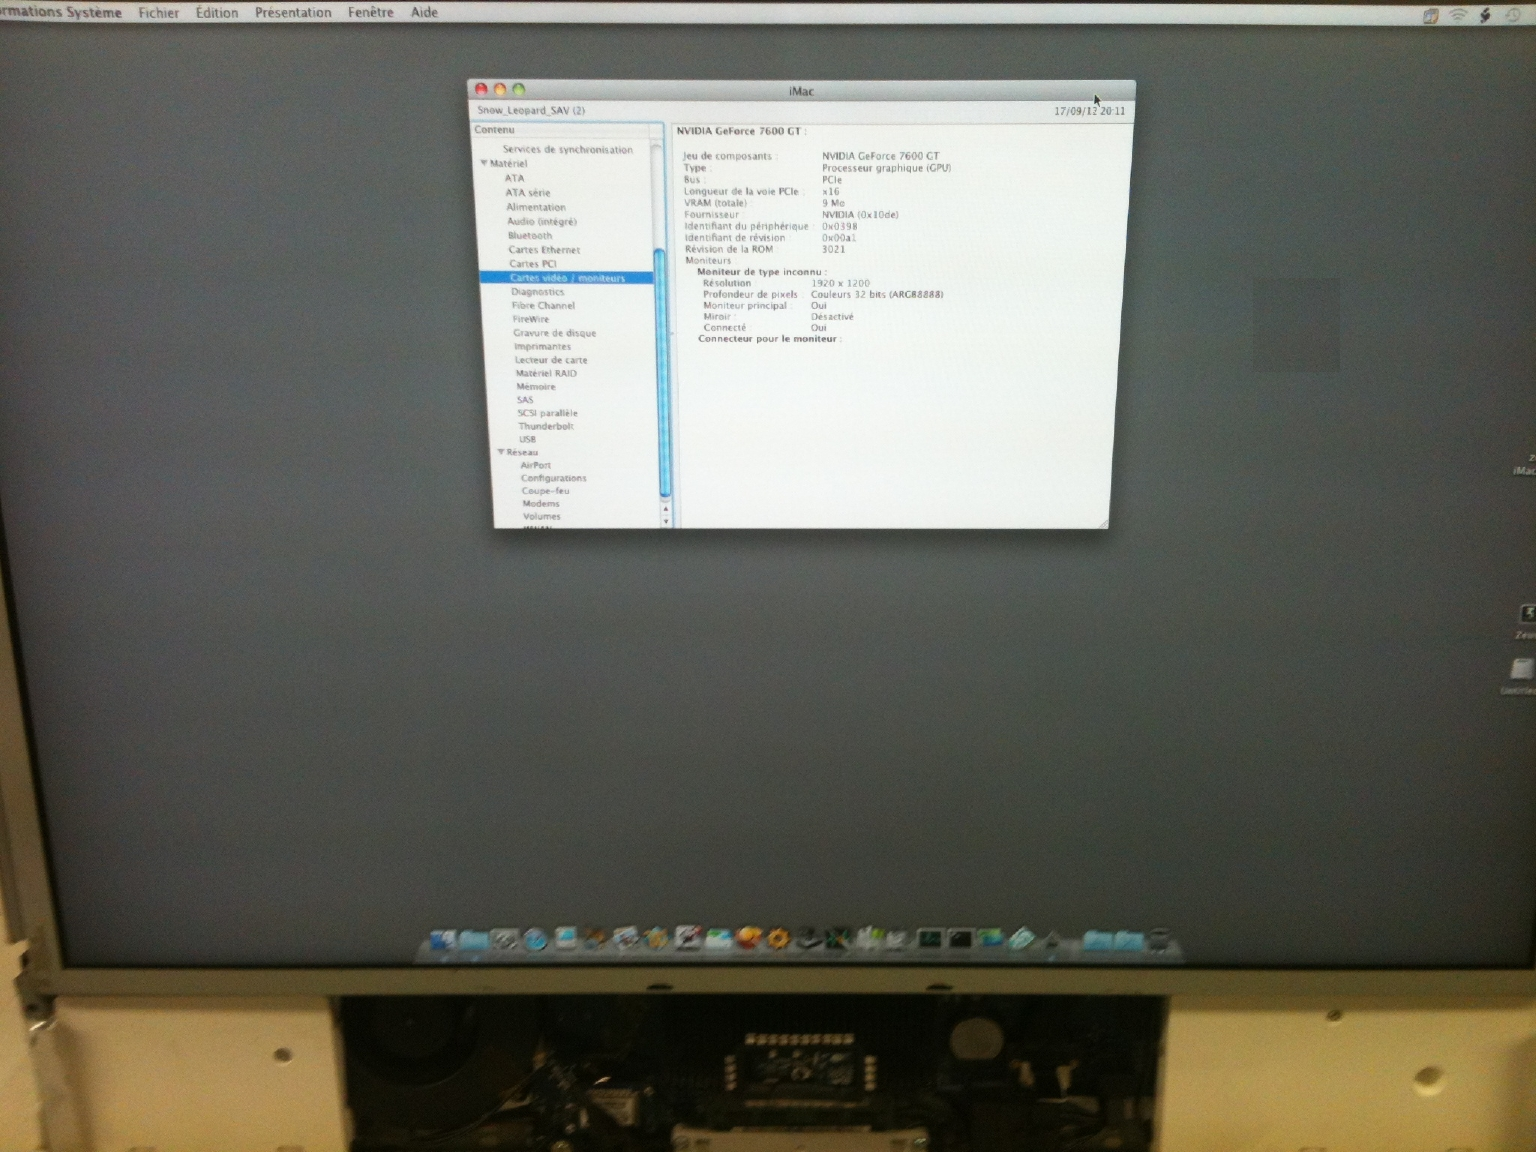 Ultimate (iMac) MXM efi rom/vbios thread